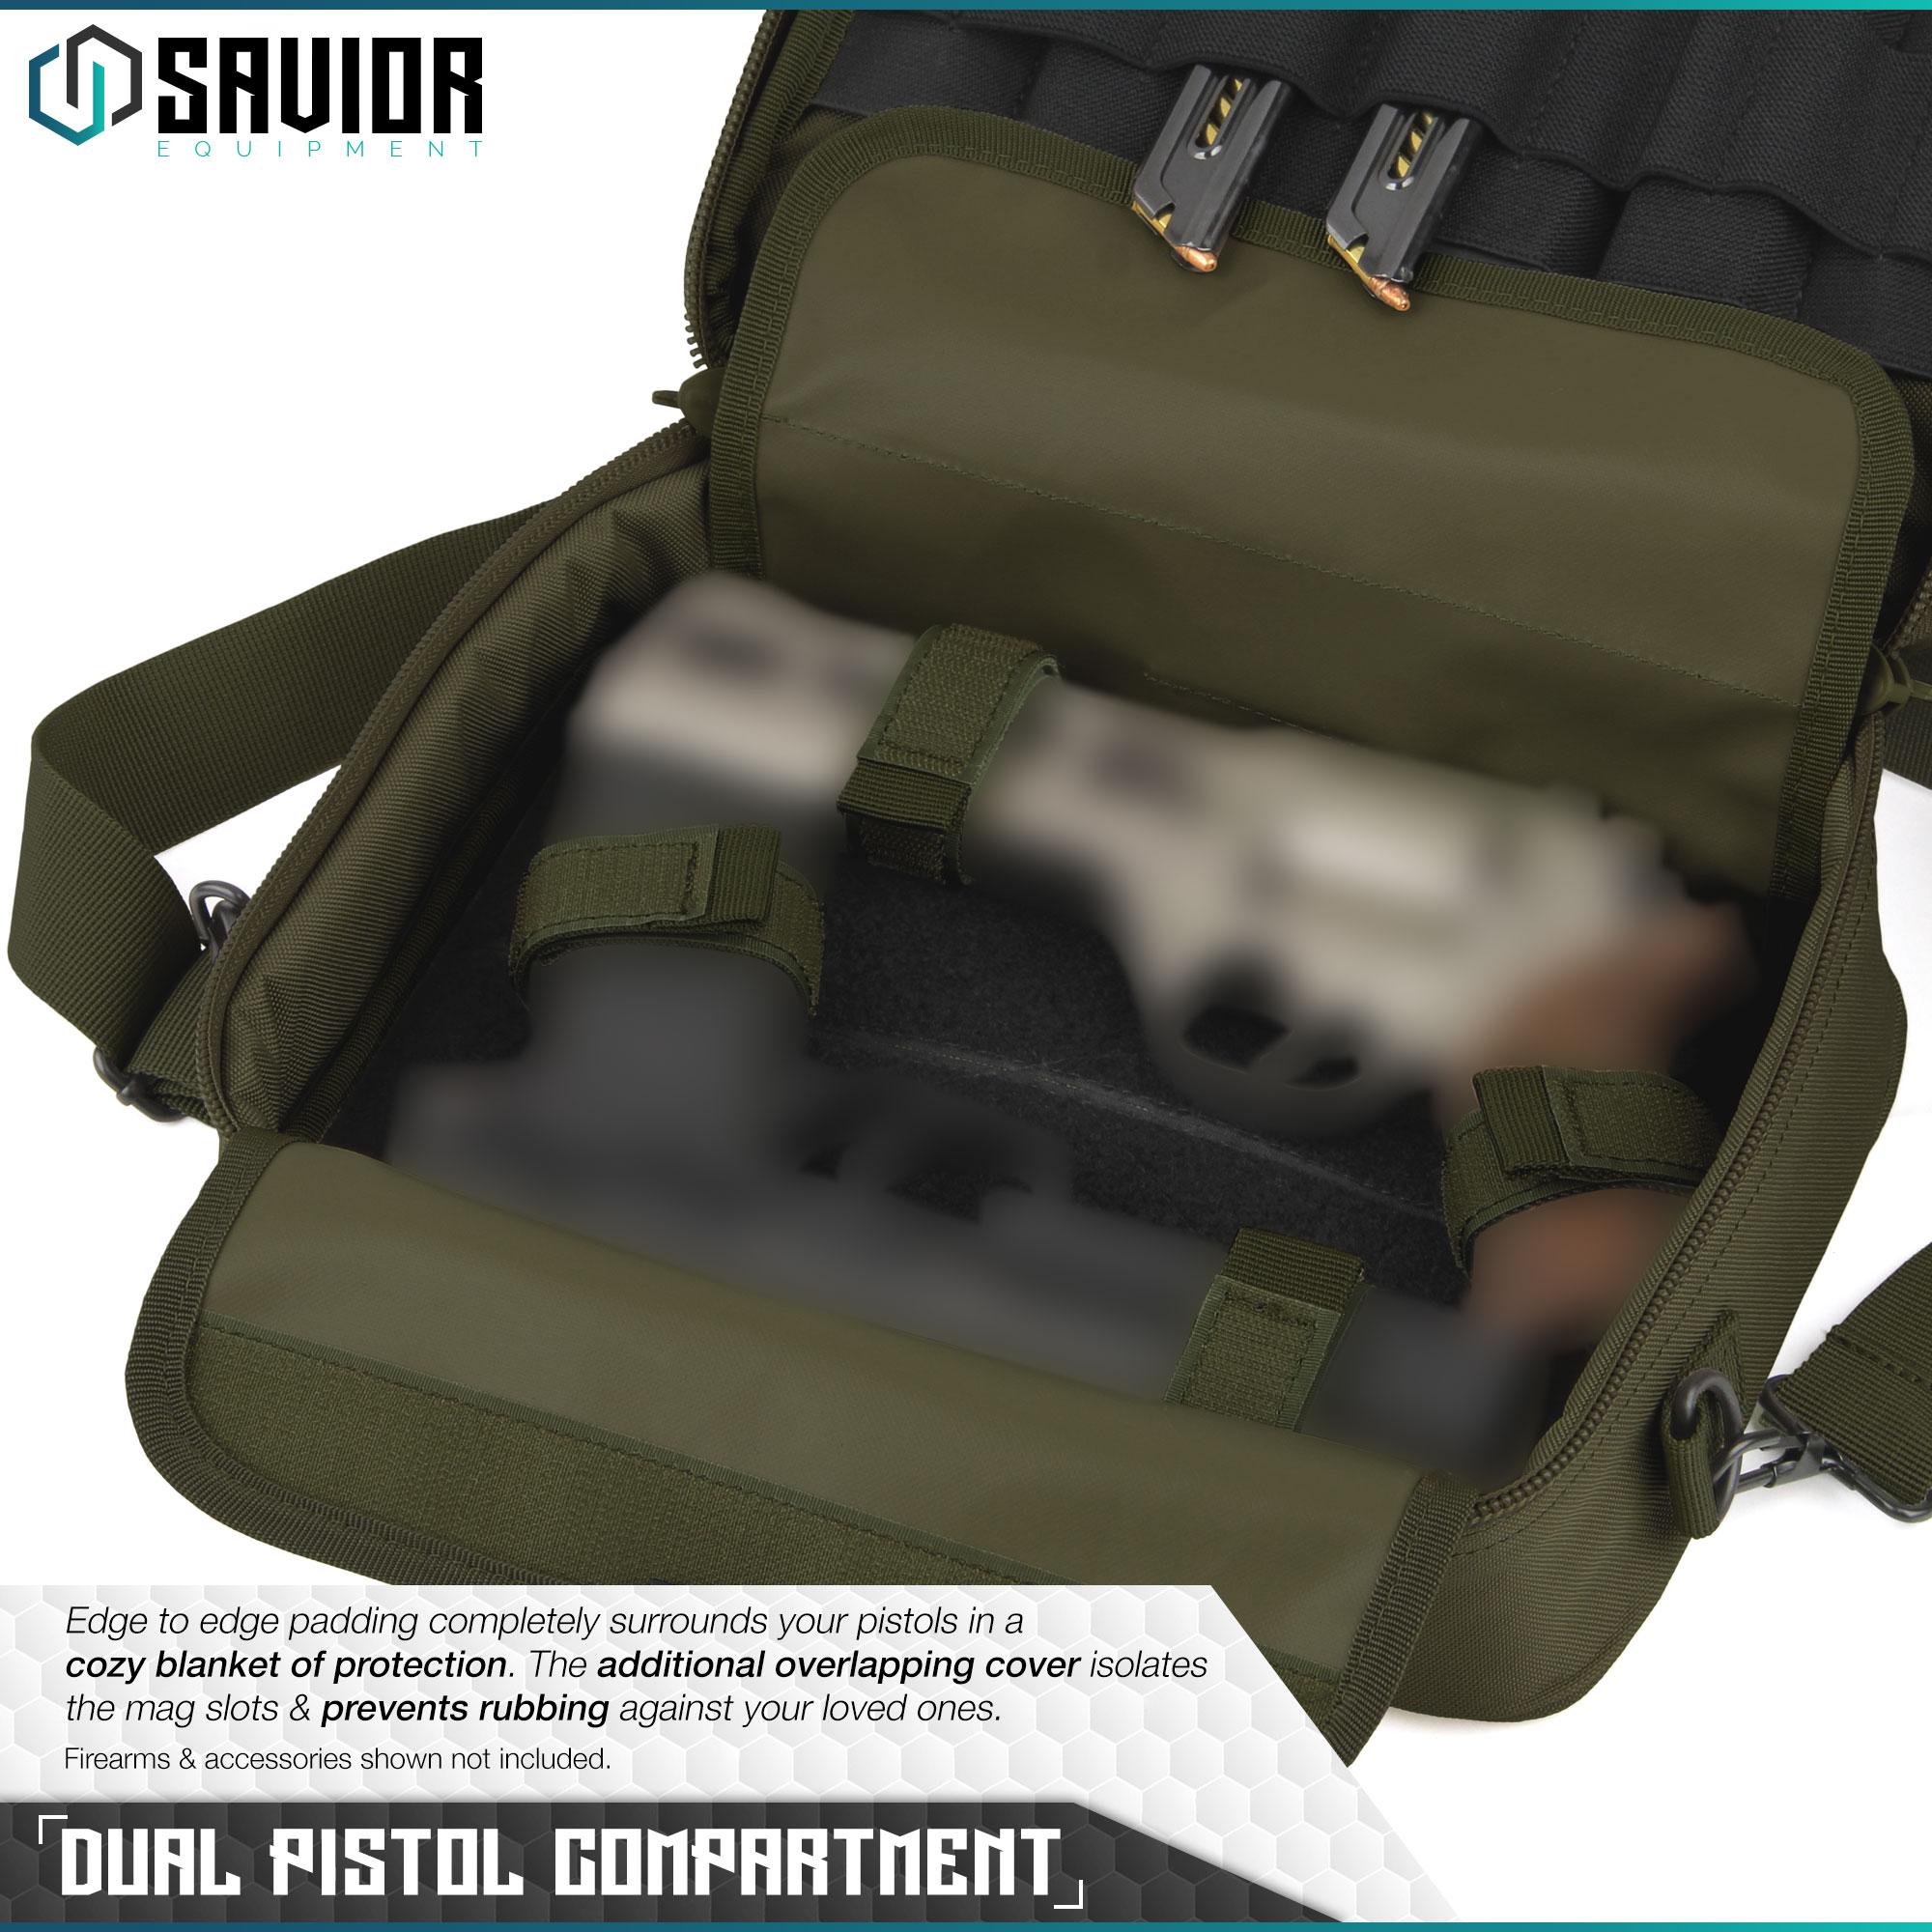 034-SAVIOR-034-Padded-Discreet-Double-Handgun-Bag-Pistol-Storage-Case-w-Mag-Pouch-Slot thumbnail 21